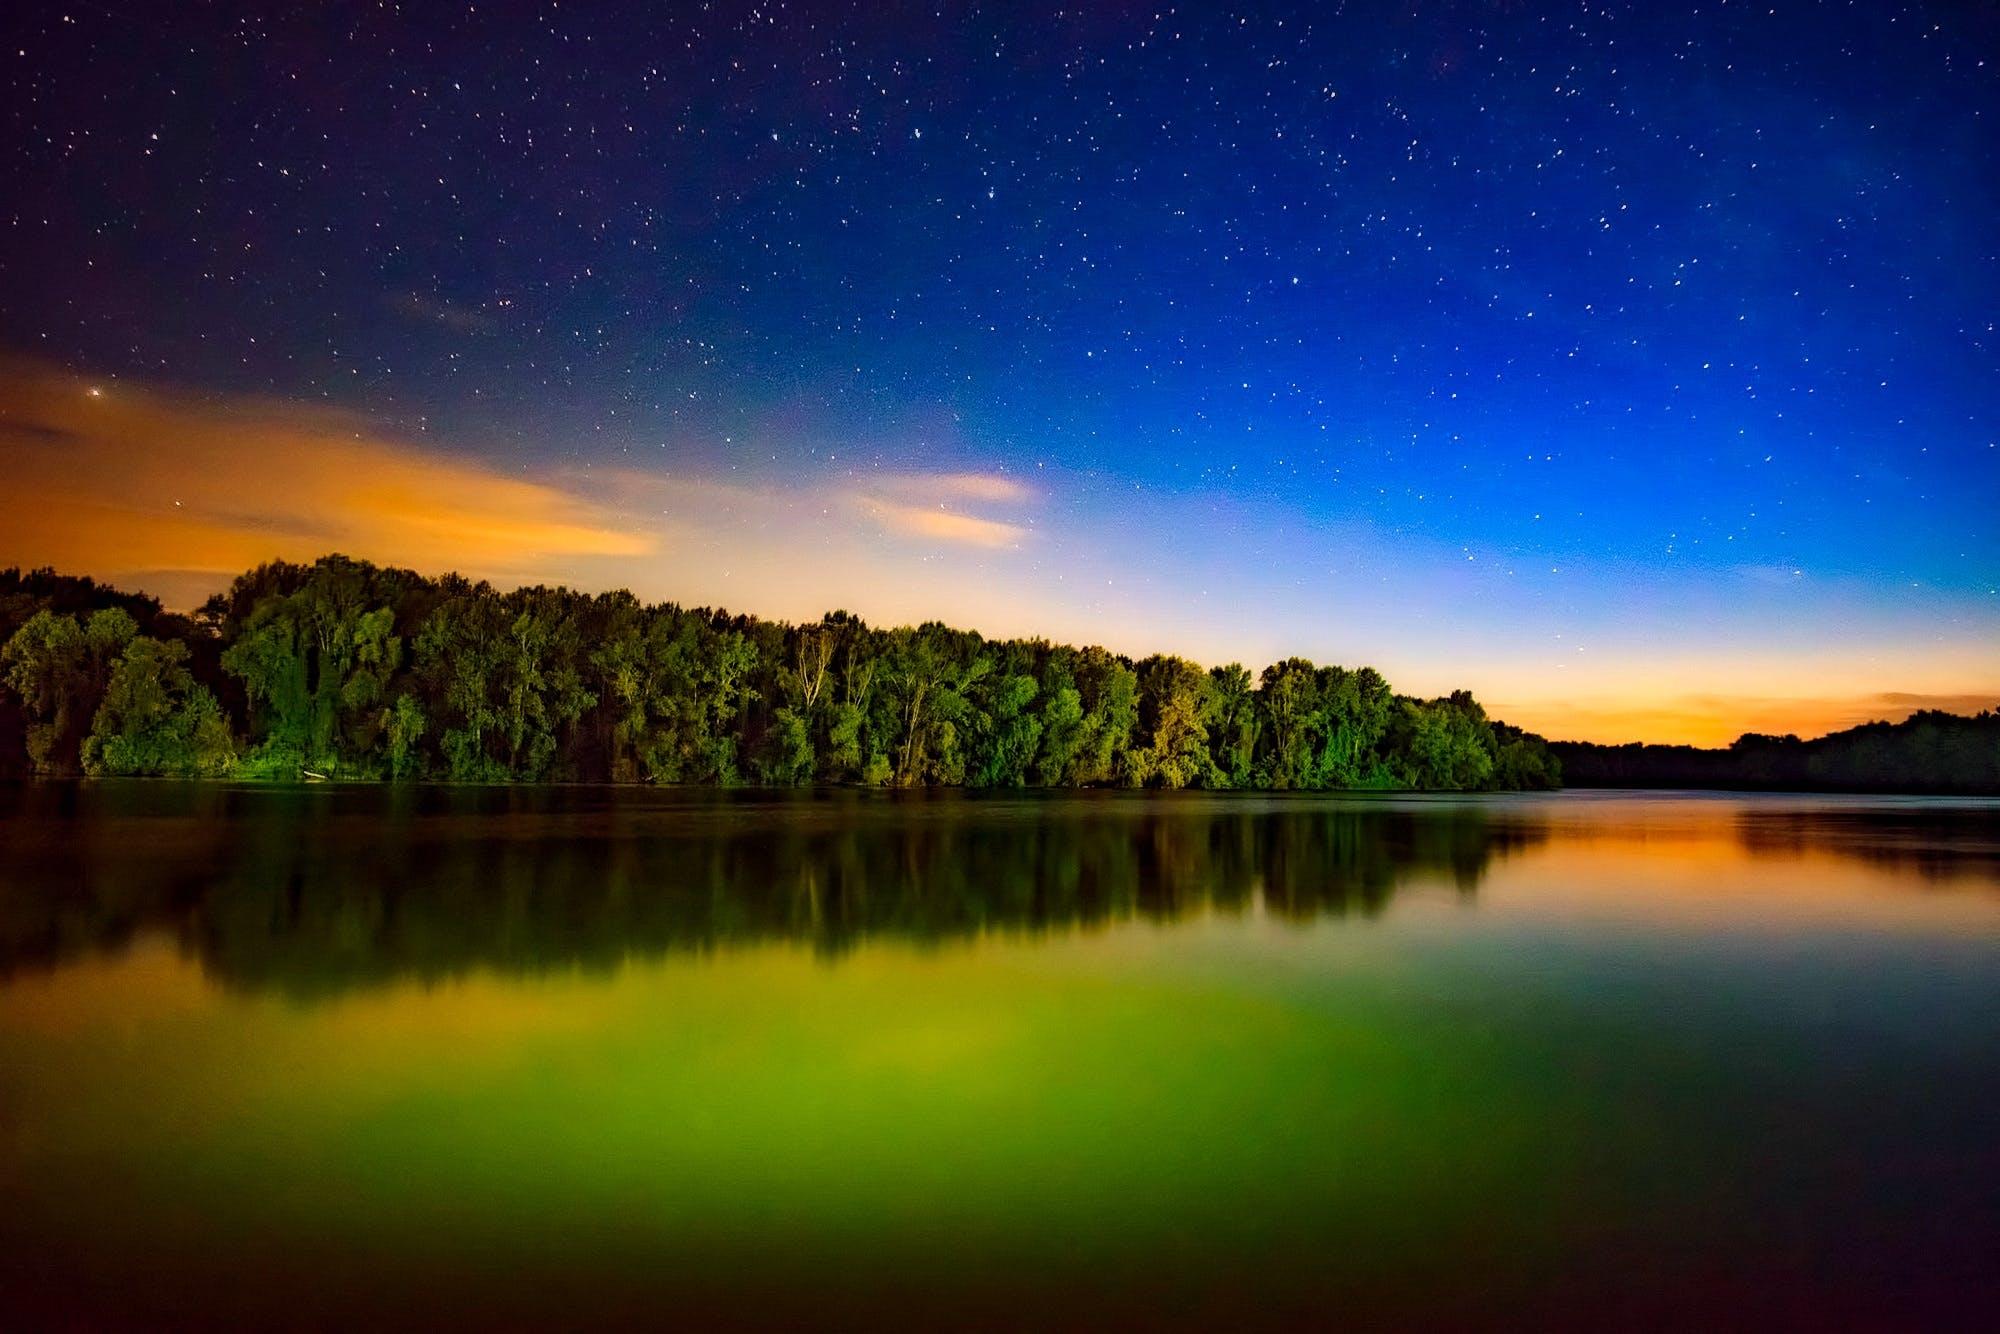 zu abend, bäume, blau, dämmerung